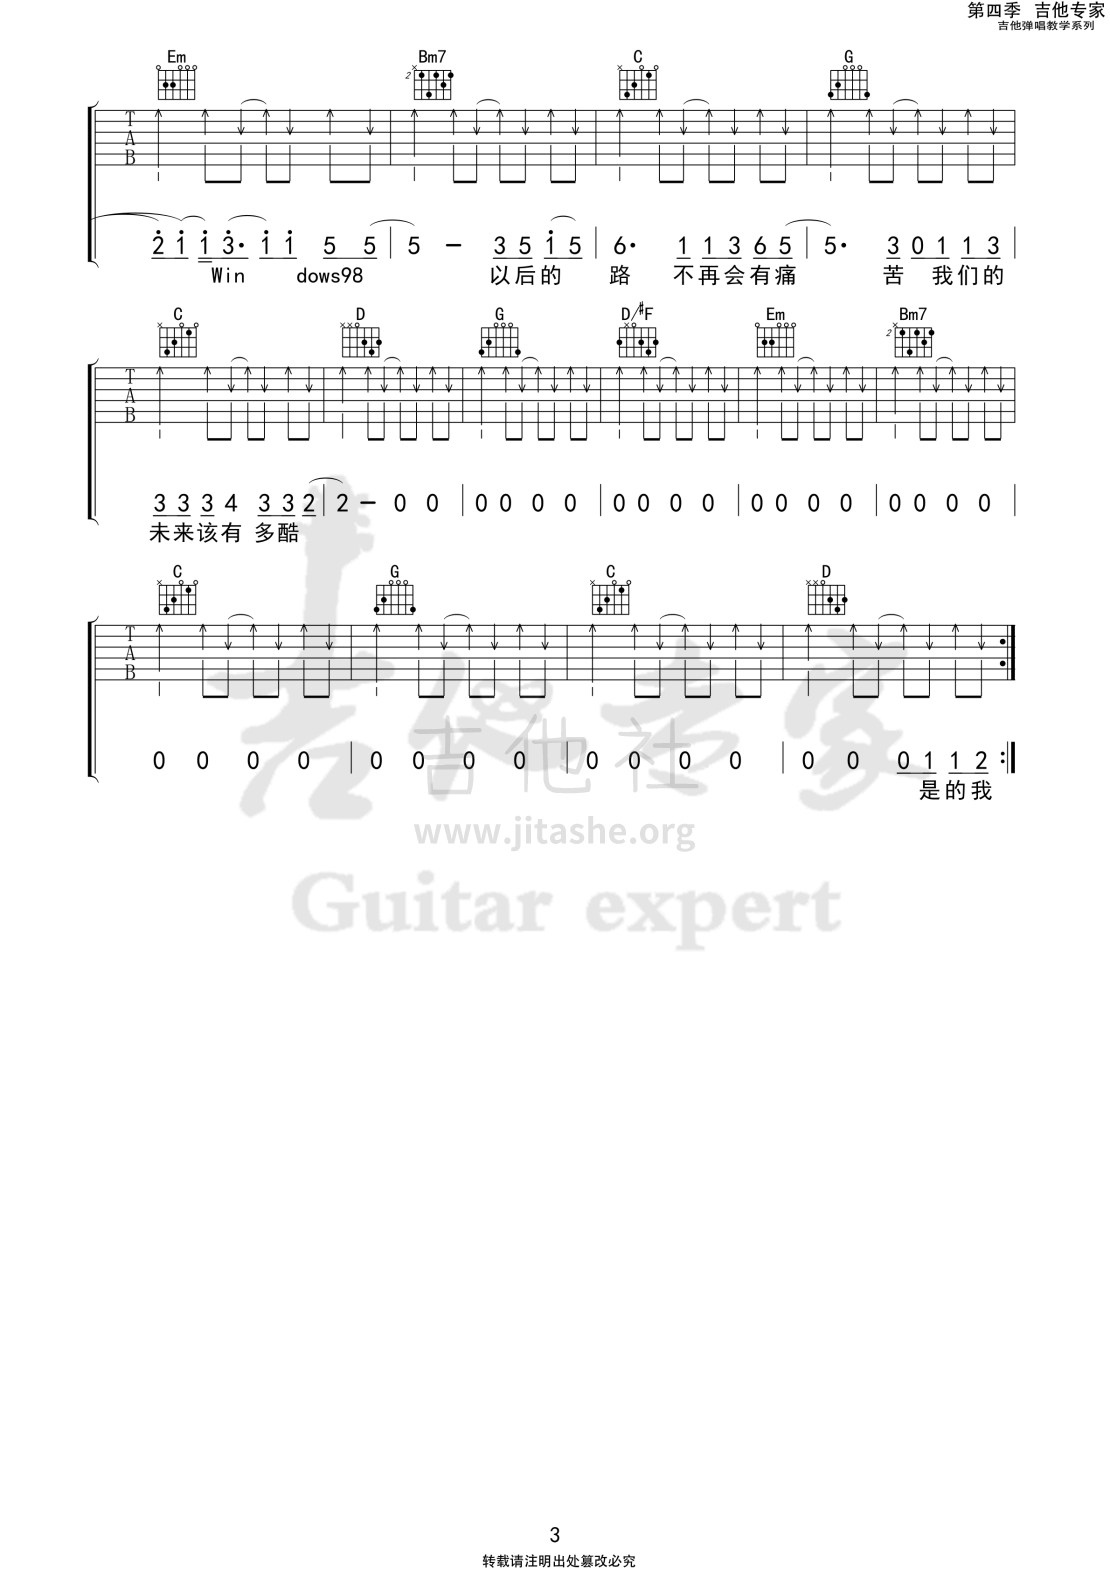 New Boy (吉他专家弹唱教学:第四季第5集)吉他谱(图片谱)_房东的猫_New Boy3 第四季第五集.jpg